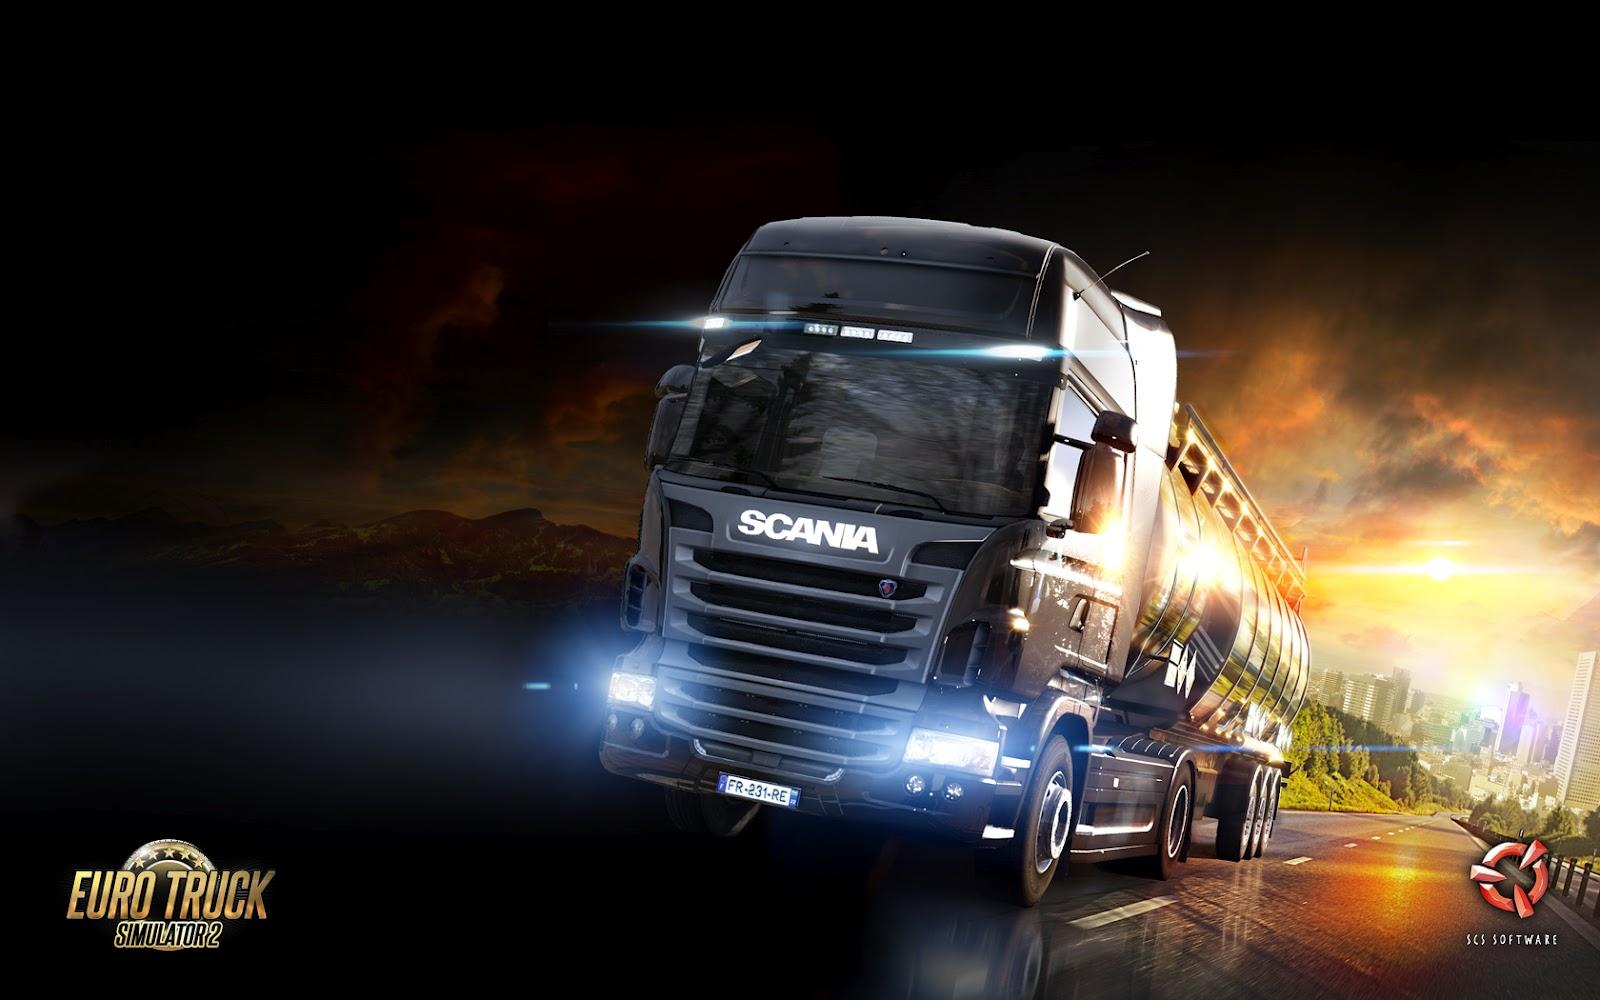 Euro Truck Simulator 2 - [Crack & Serial] - Completo! 1680x1050_A